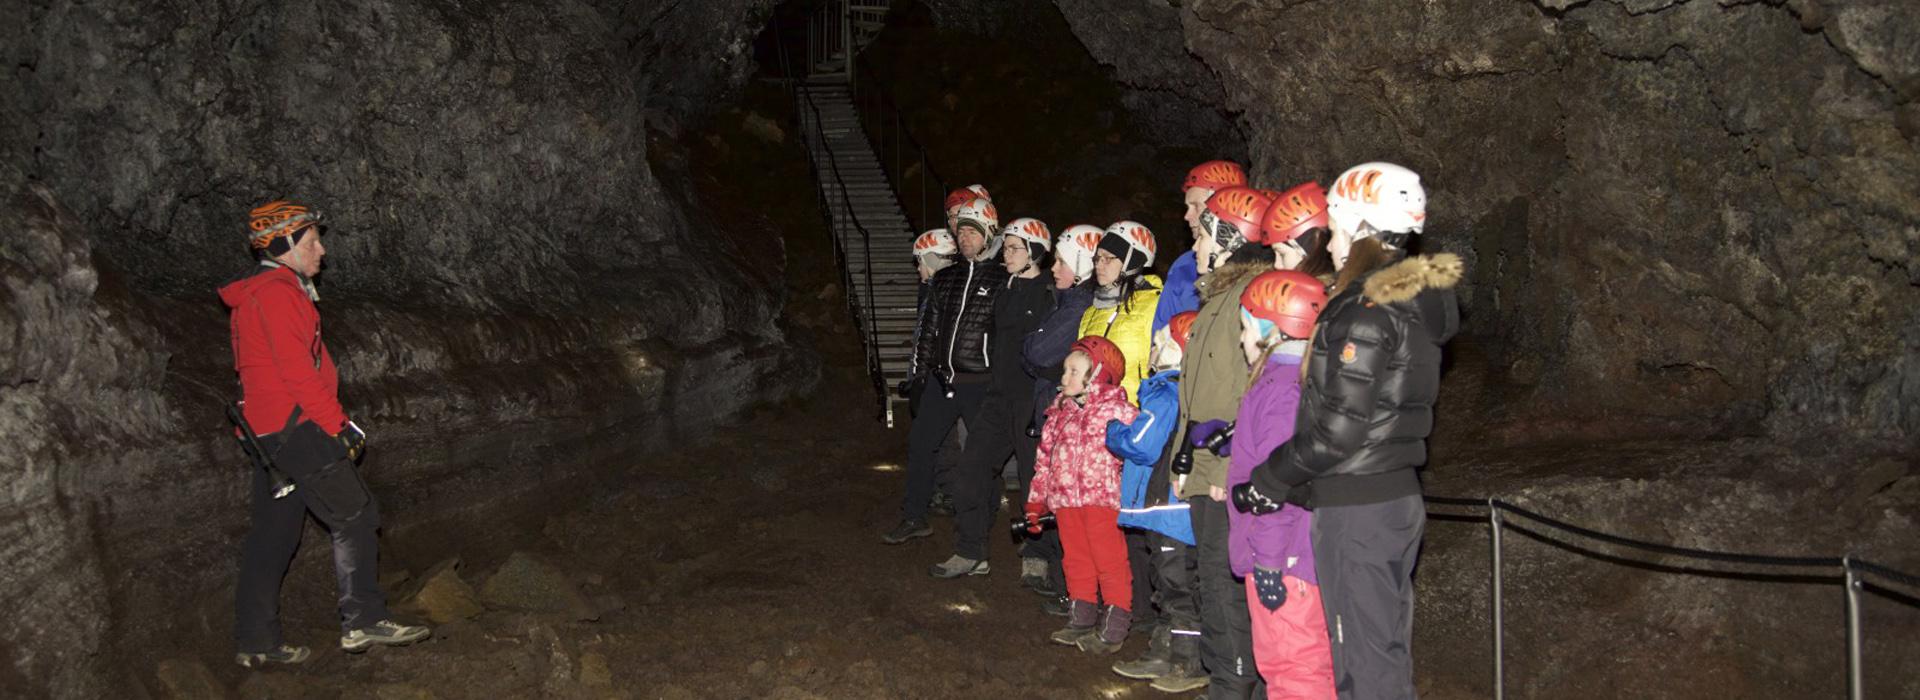 Group tour in Vatnshellir cave, Iceland